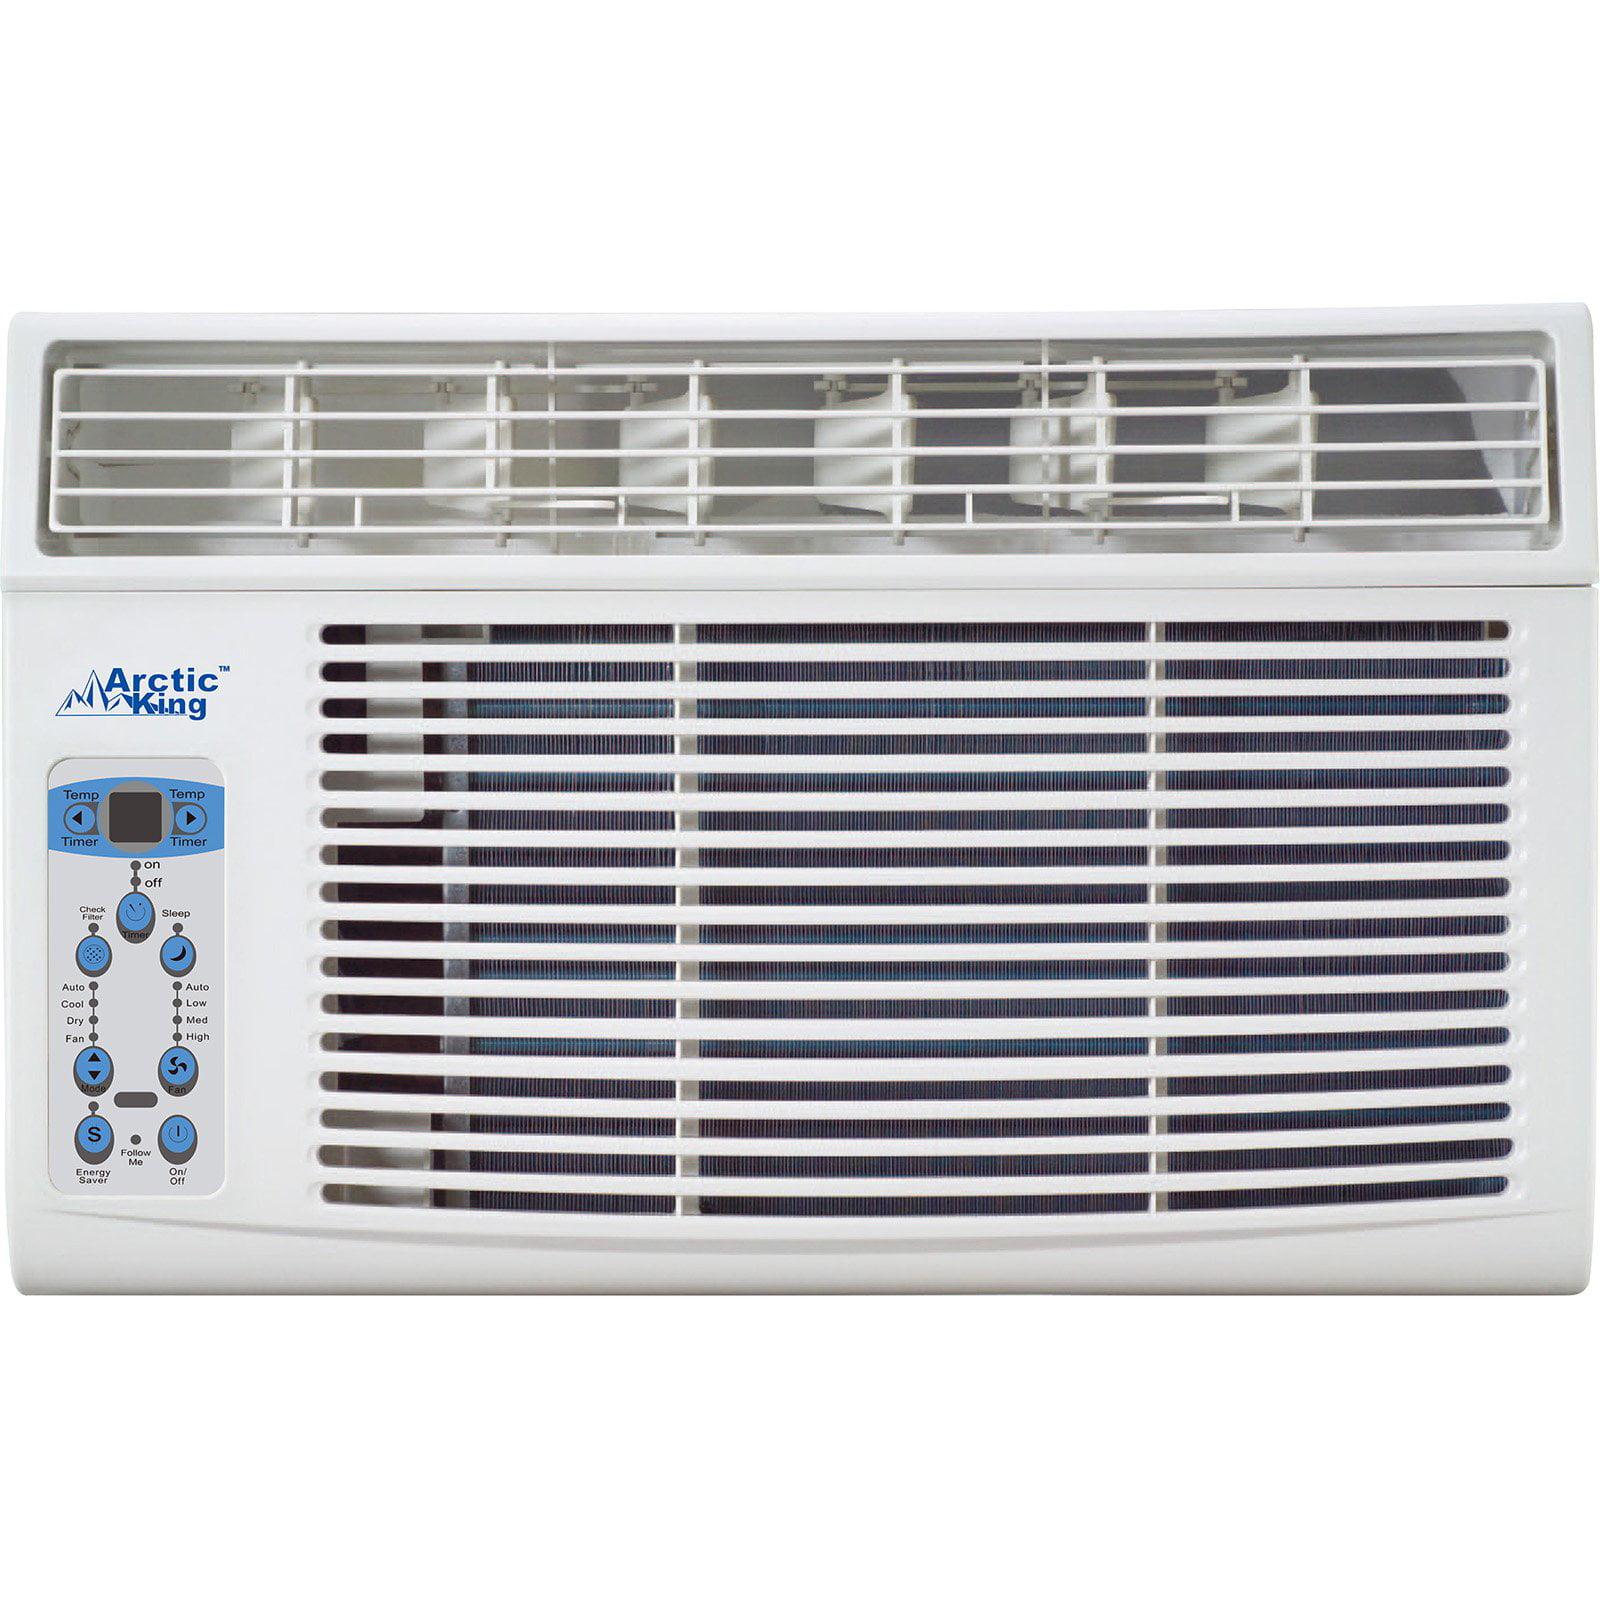 Arctic King 8K 115V Window Air Conditioner